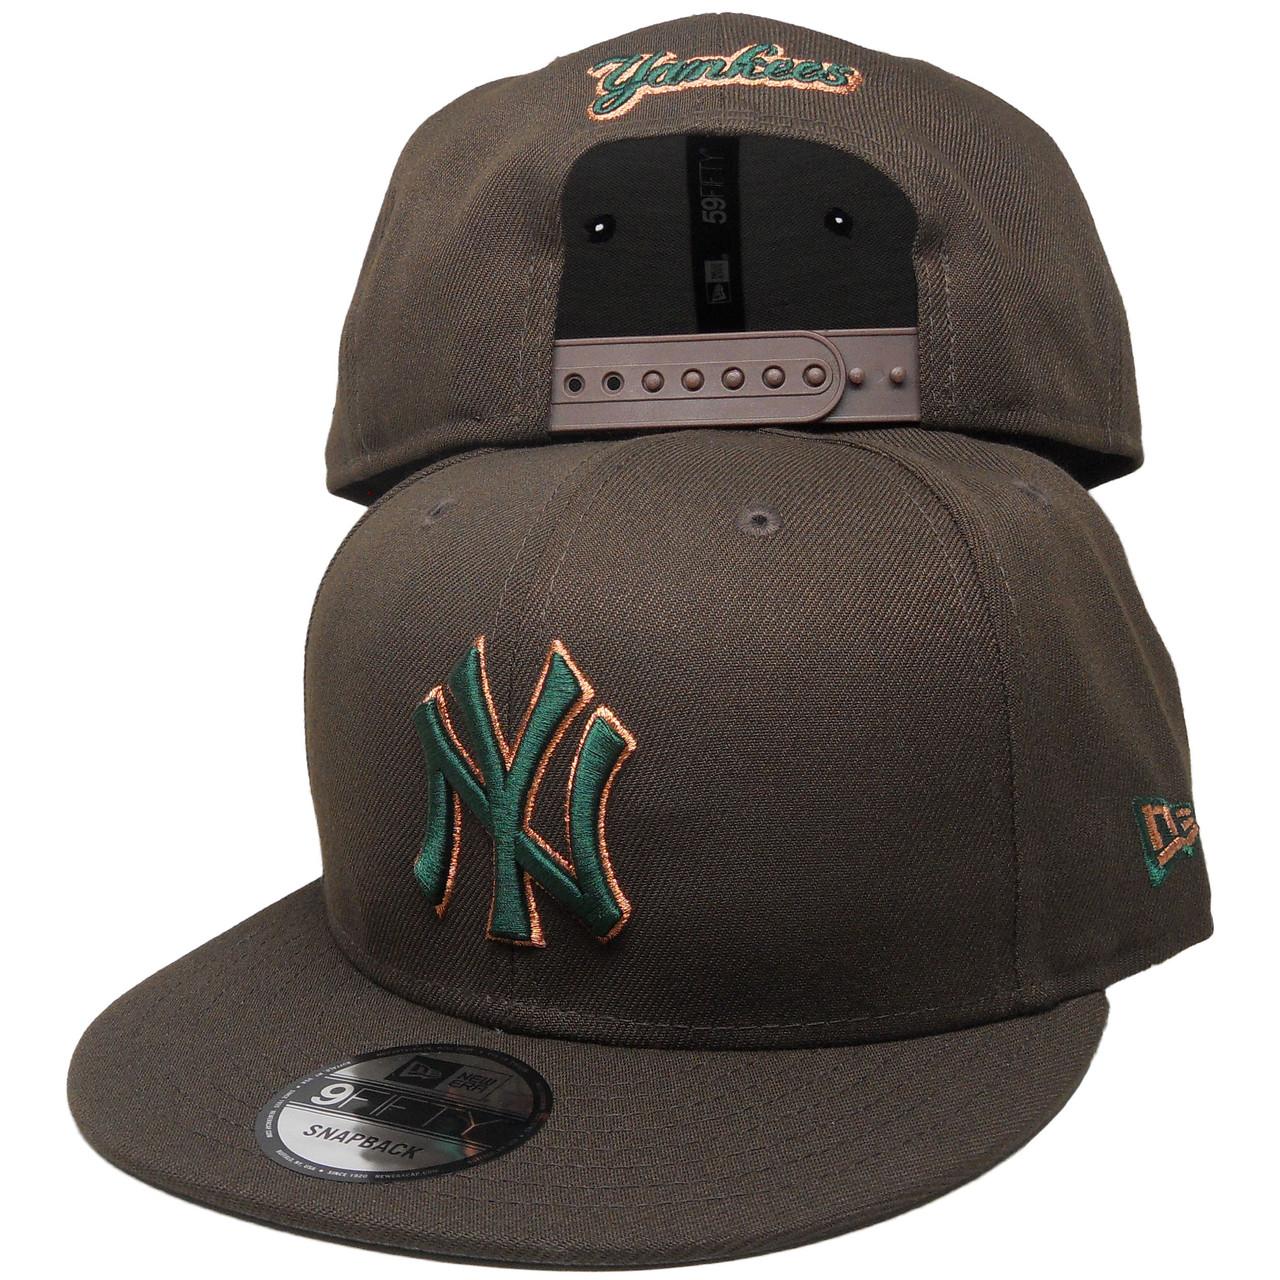 2b085c45 New York Yankees New Era Custom 9Fifty Snapback - Brown, Green, Copper -  ECapsUnlimited.com